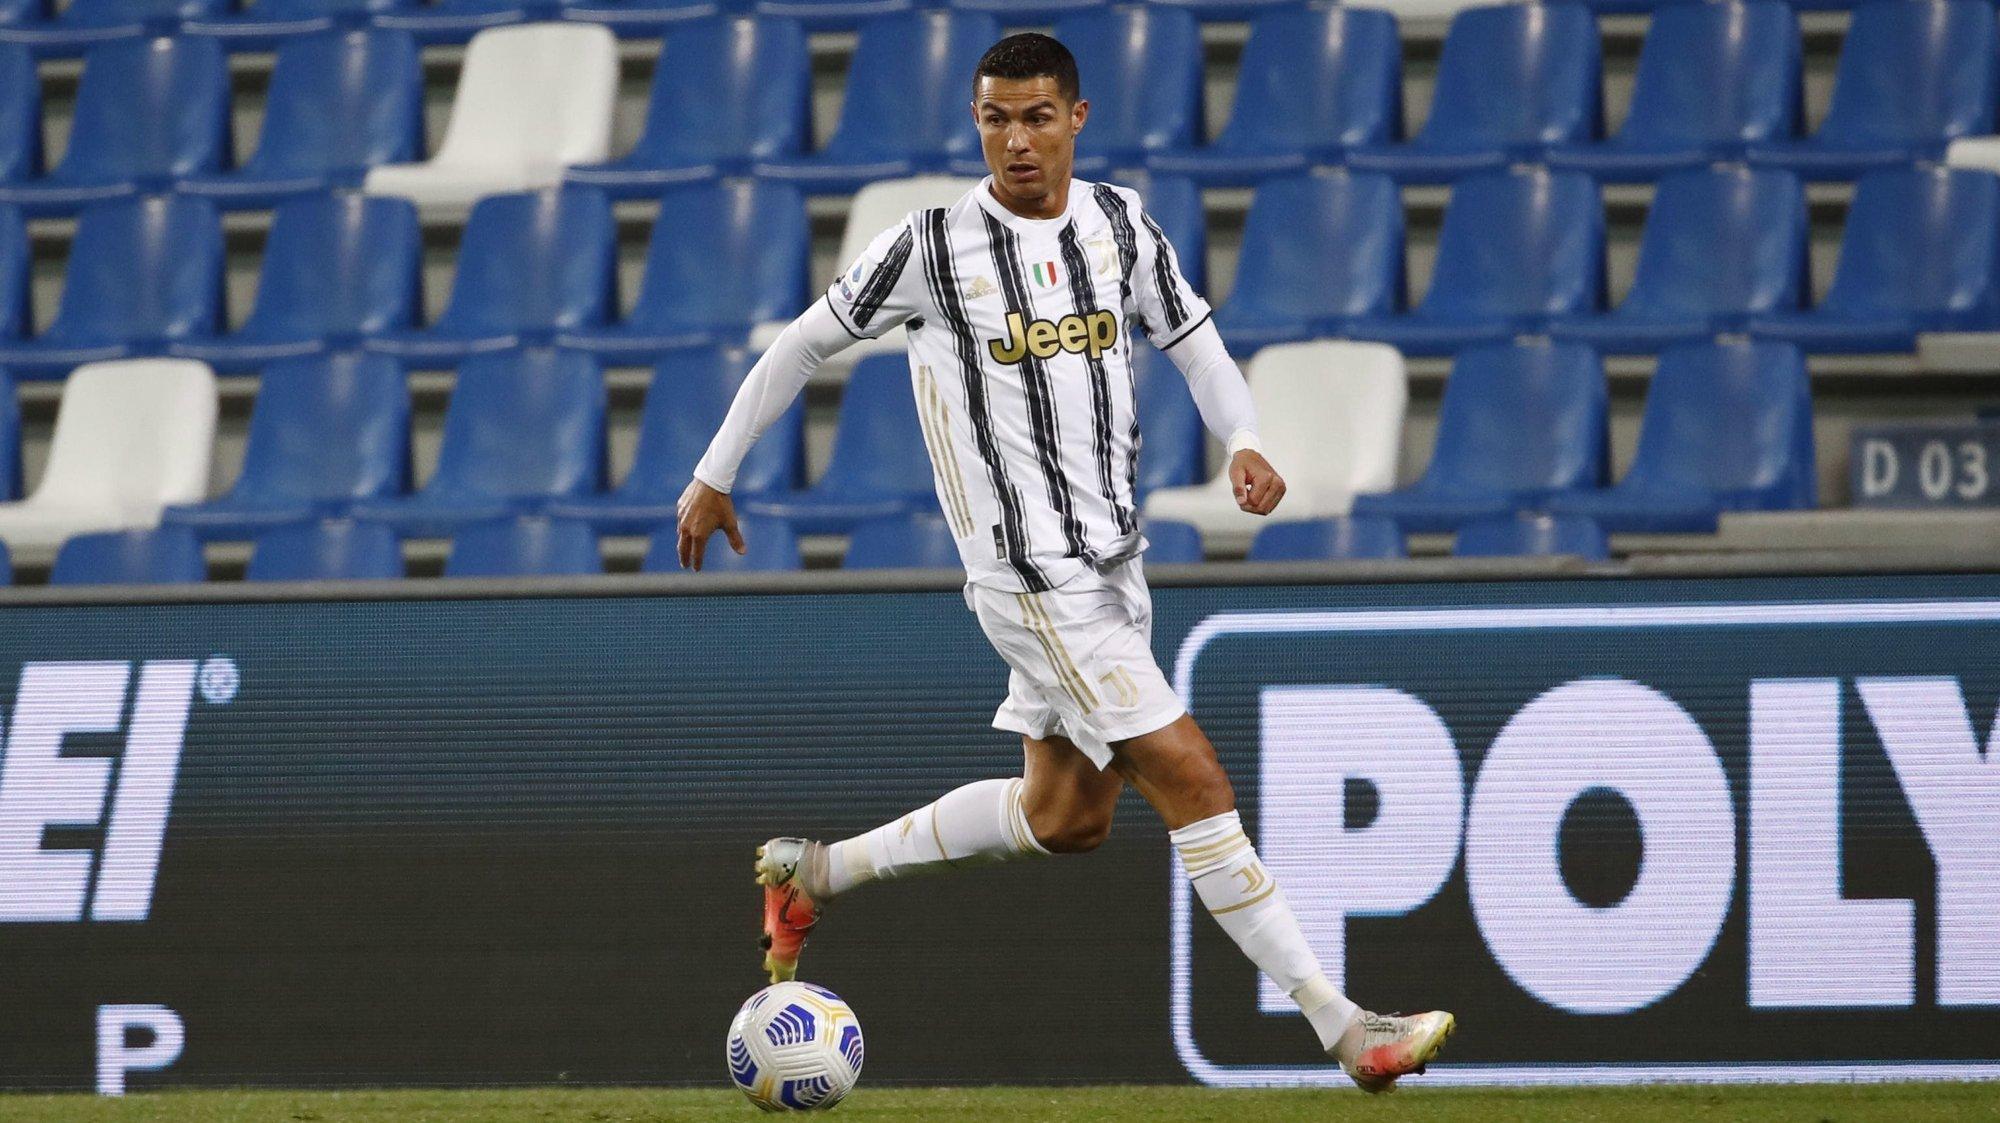 epa09195001 Juventus'  Cristiano Ronaldo in action during the Italian Serie A soccer match US Sassuolo vs Juventus FC at Mapei Stadium in Reggio Emilia, Italy, 12 May 2021.  EPA/ELISABETTA BARACCHI